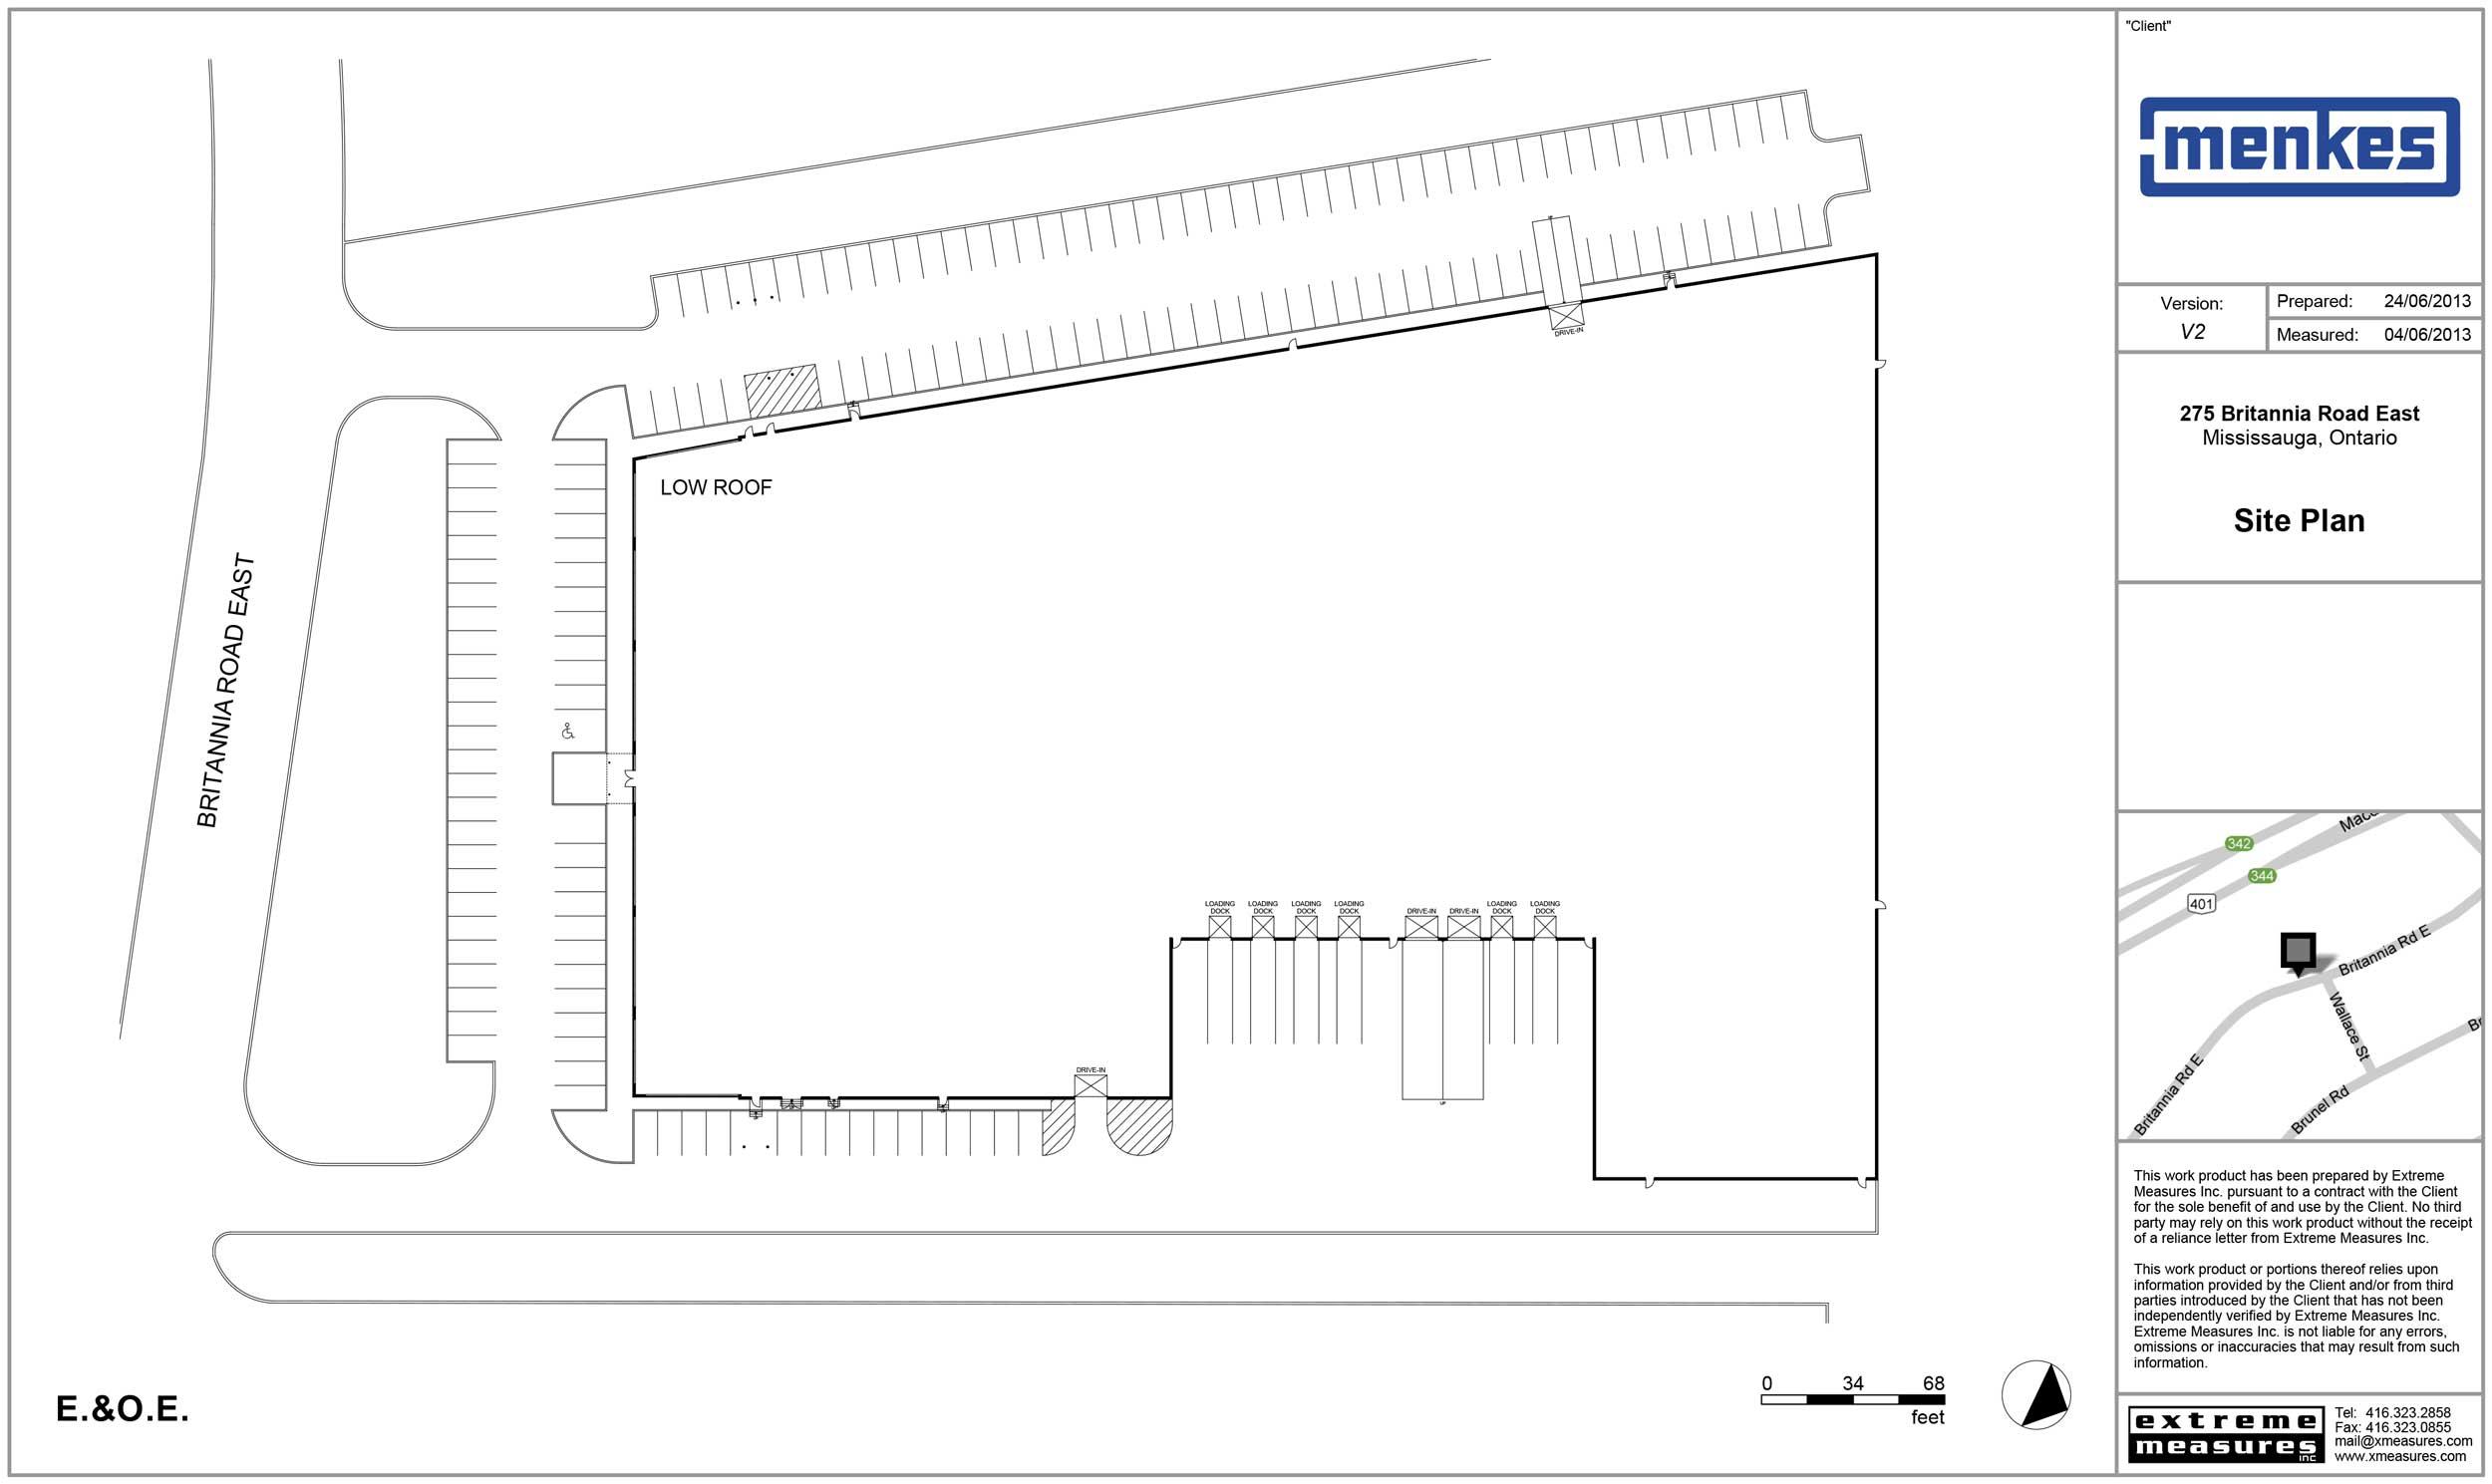 275 Britannia Road E Site Plan